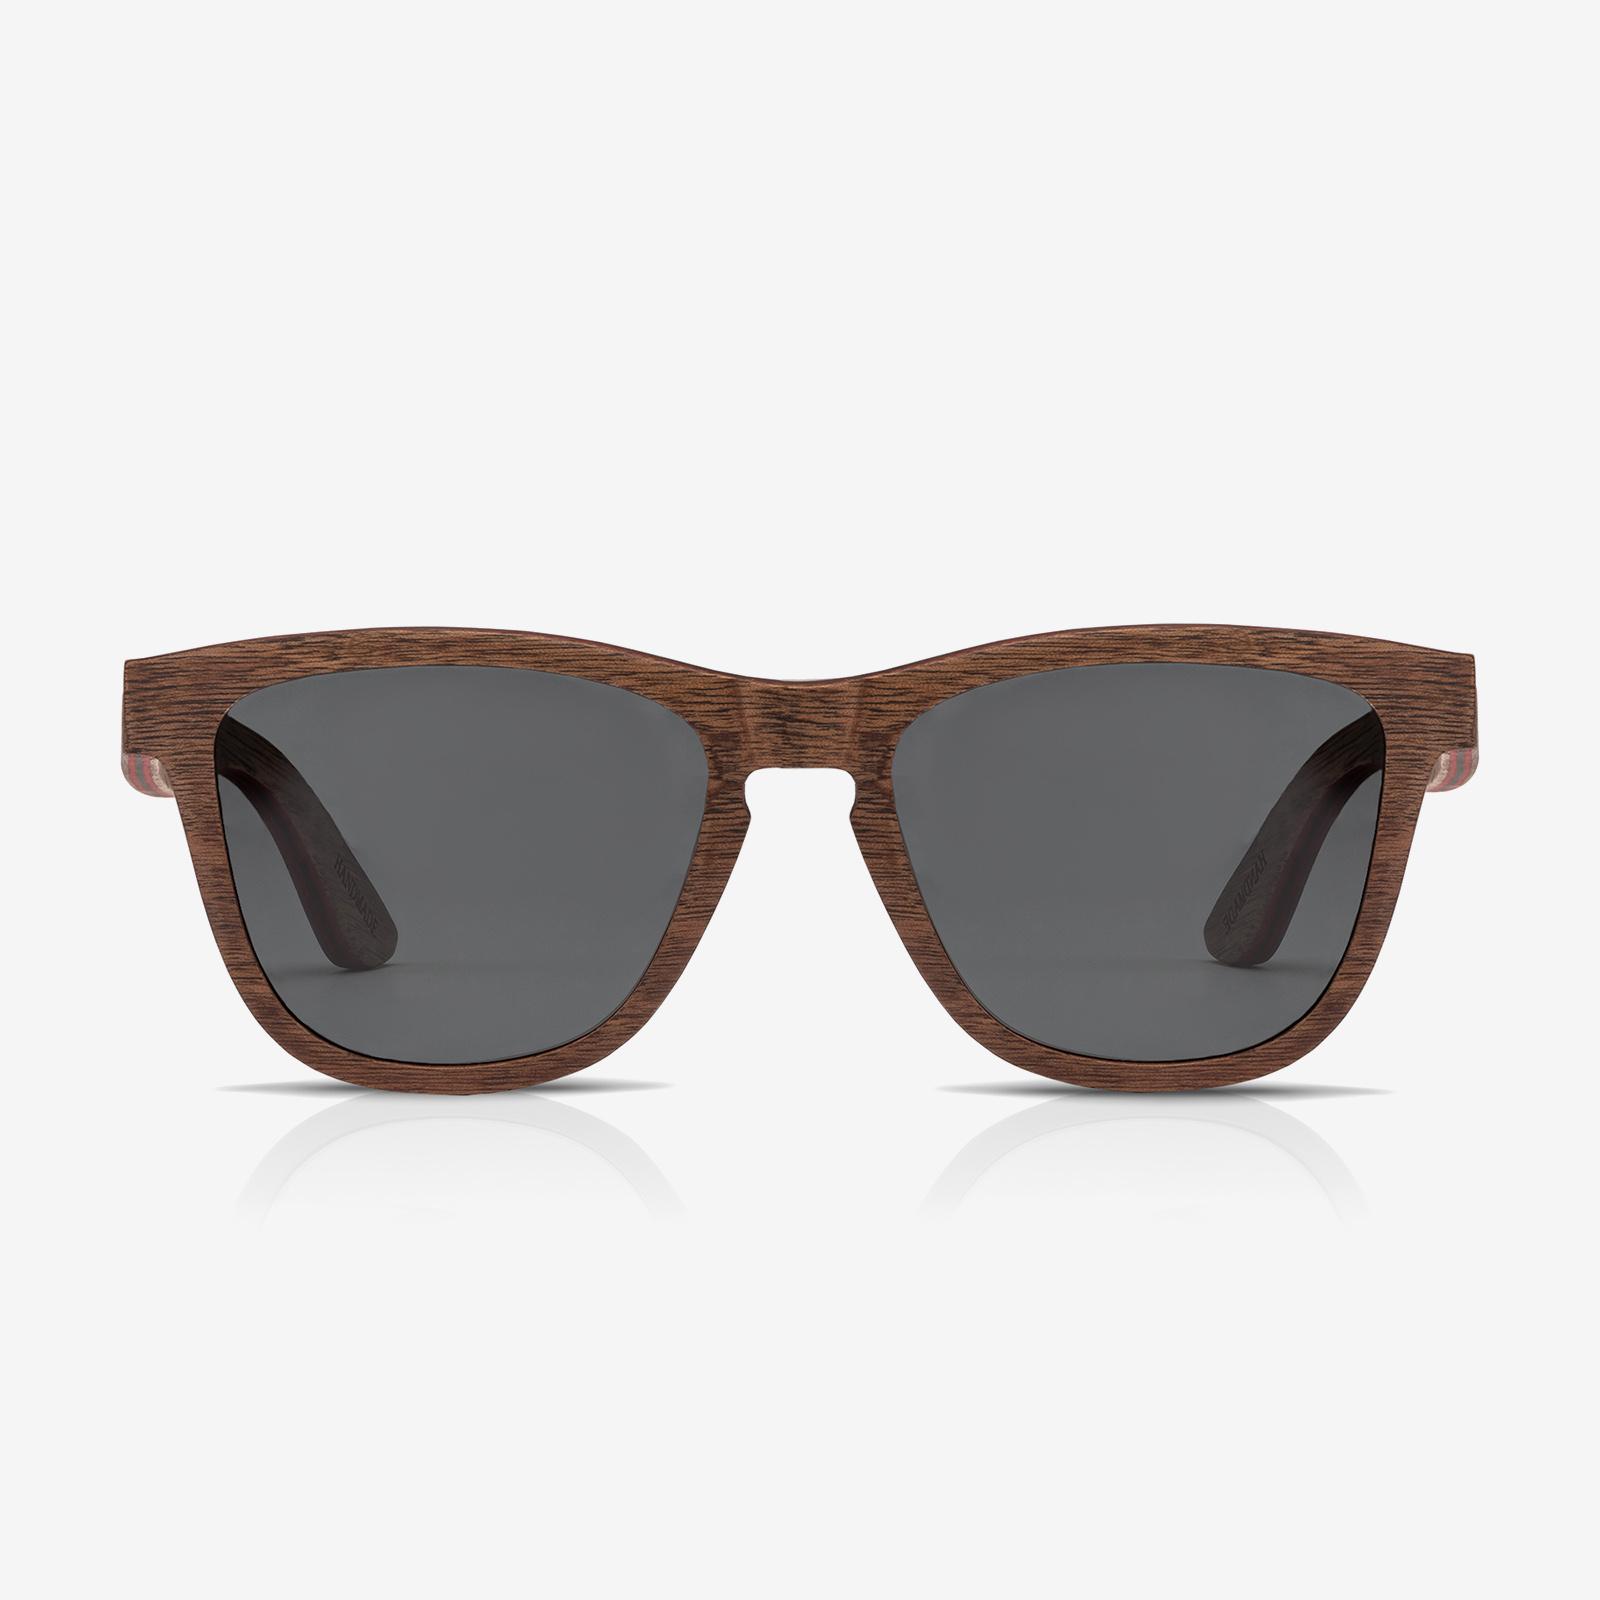 Sunglasses product image